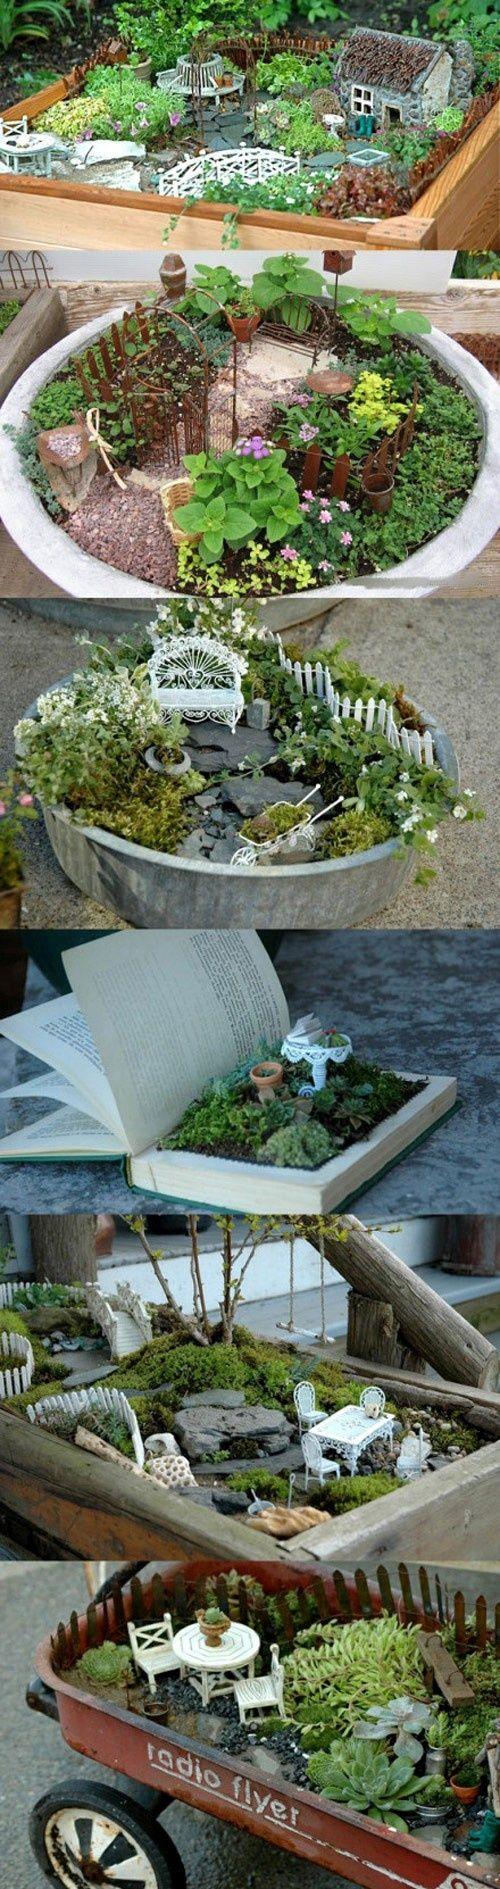 best gardening images on pinterest